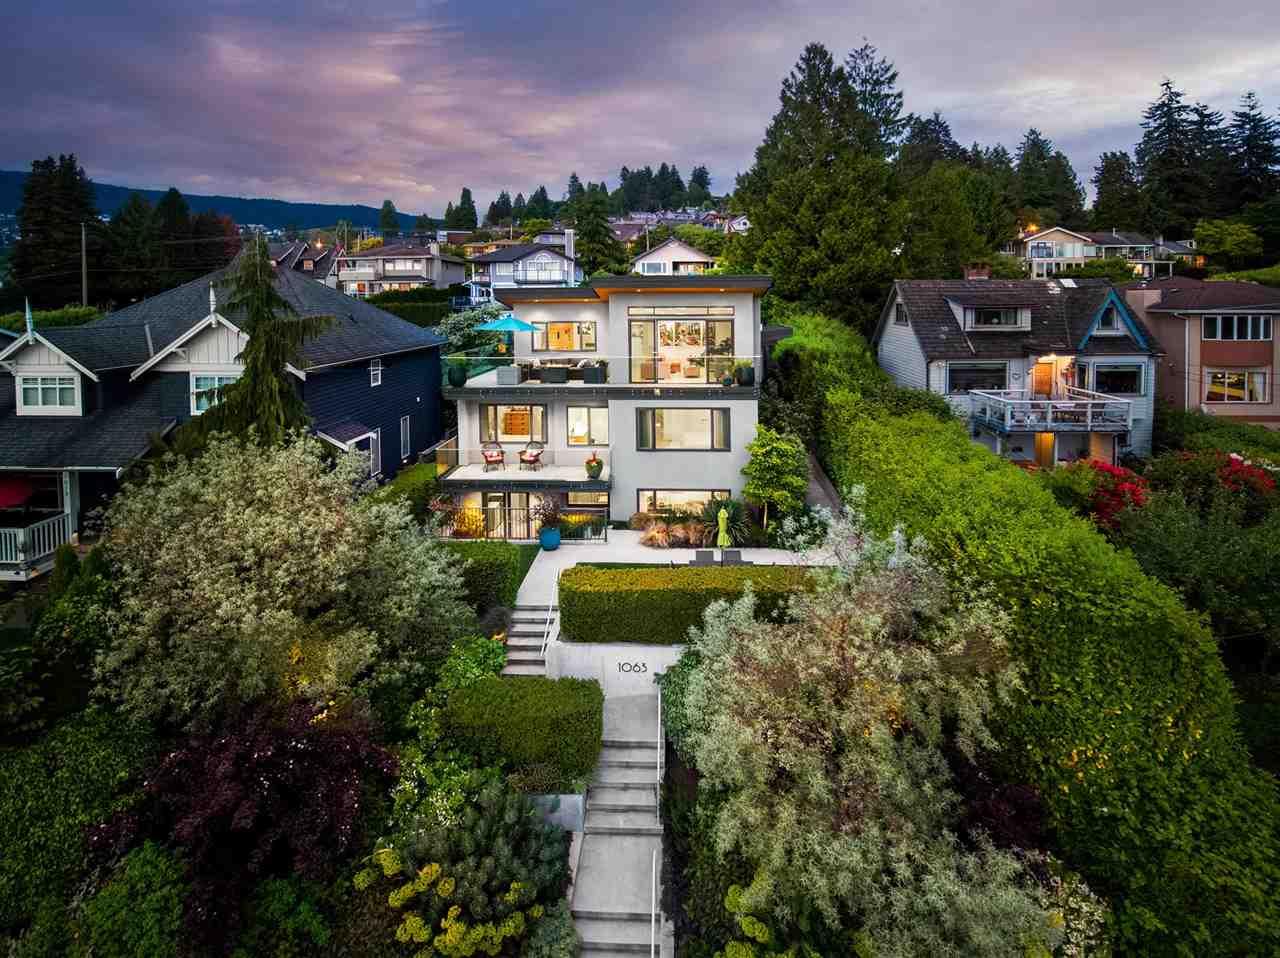 1063 ESPLANADE AVENUE - Park Royal House/Single Family for sale, 4 Bedrooms (R2621173) - #1